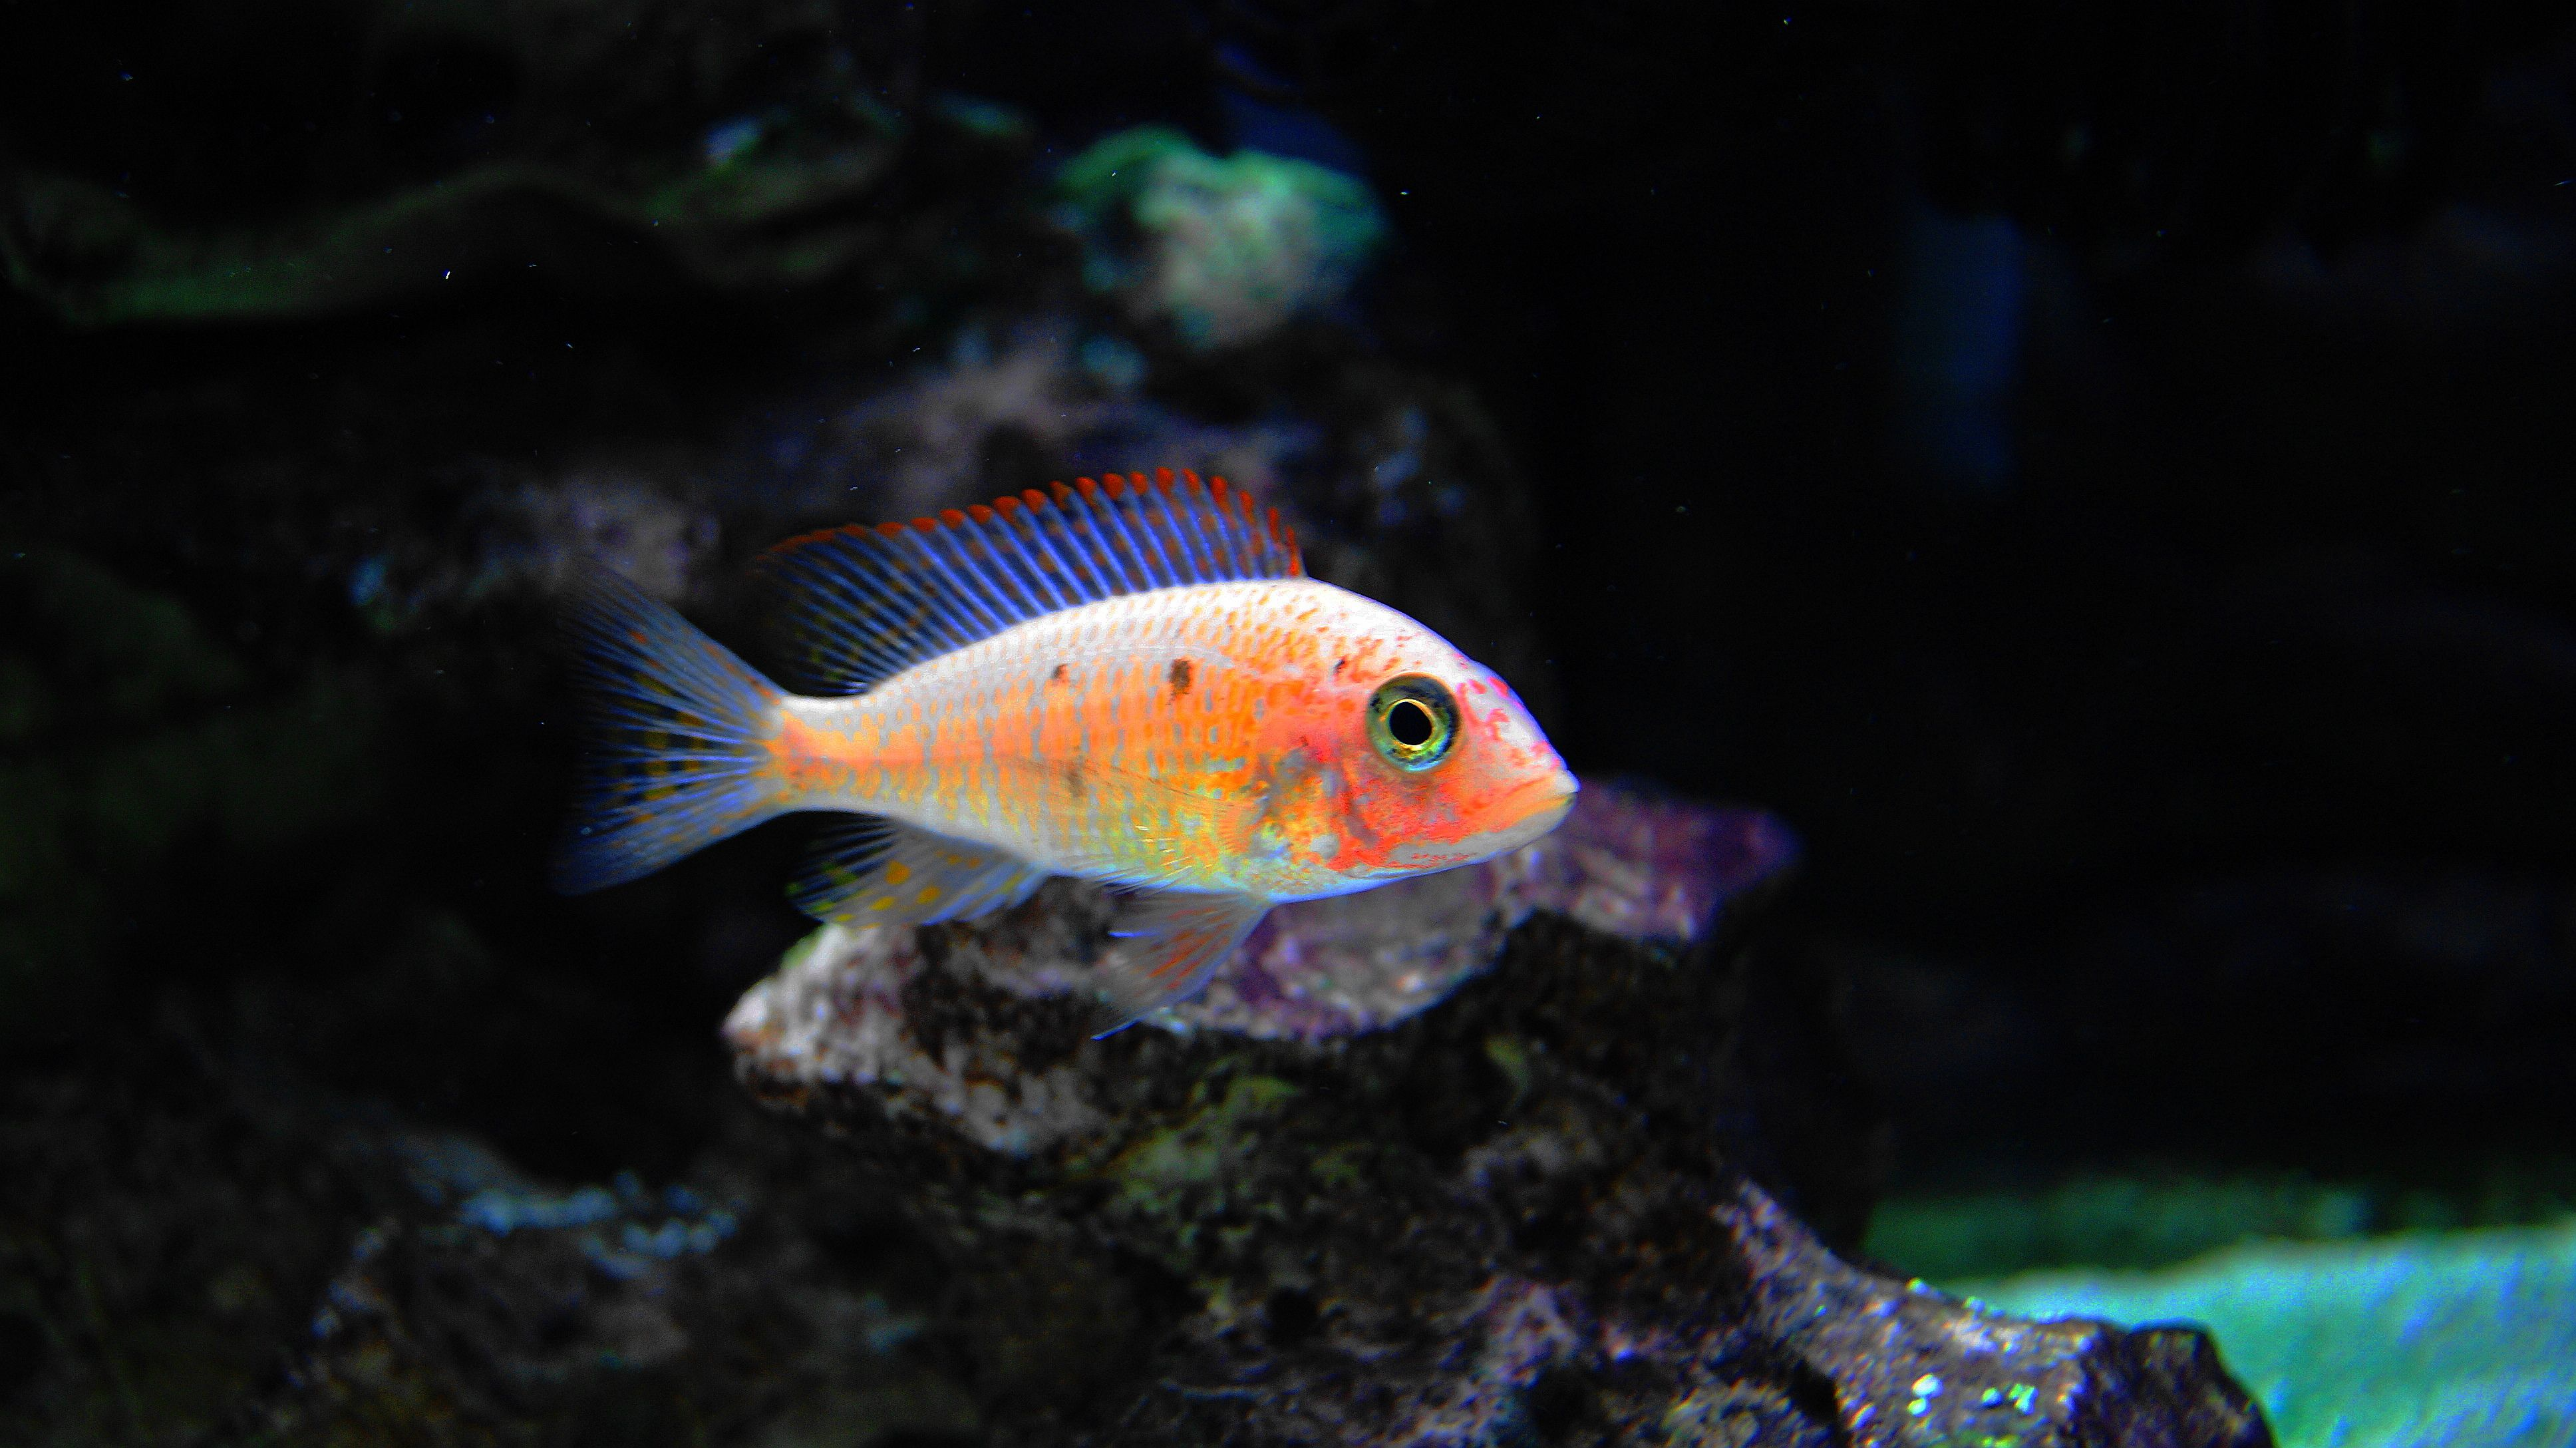 Strawberry Peacock Cichlids African Cichlids Aquarium Fish